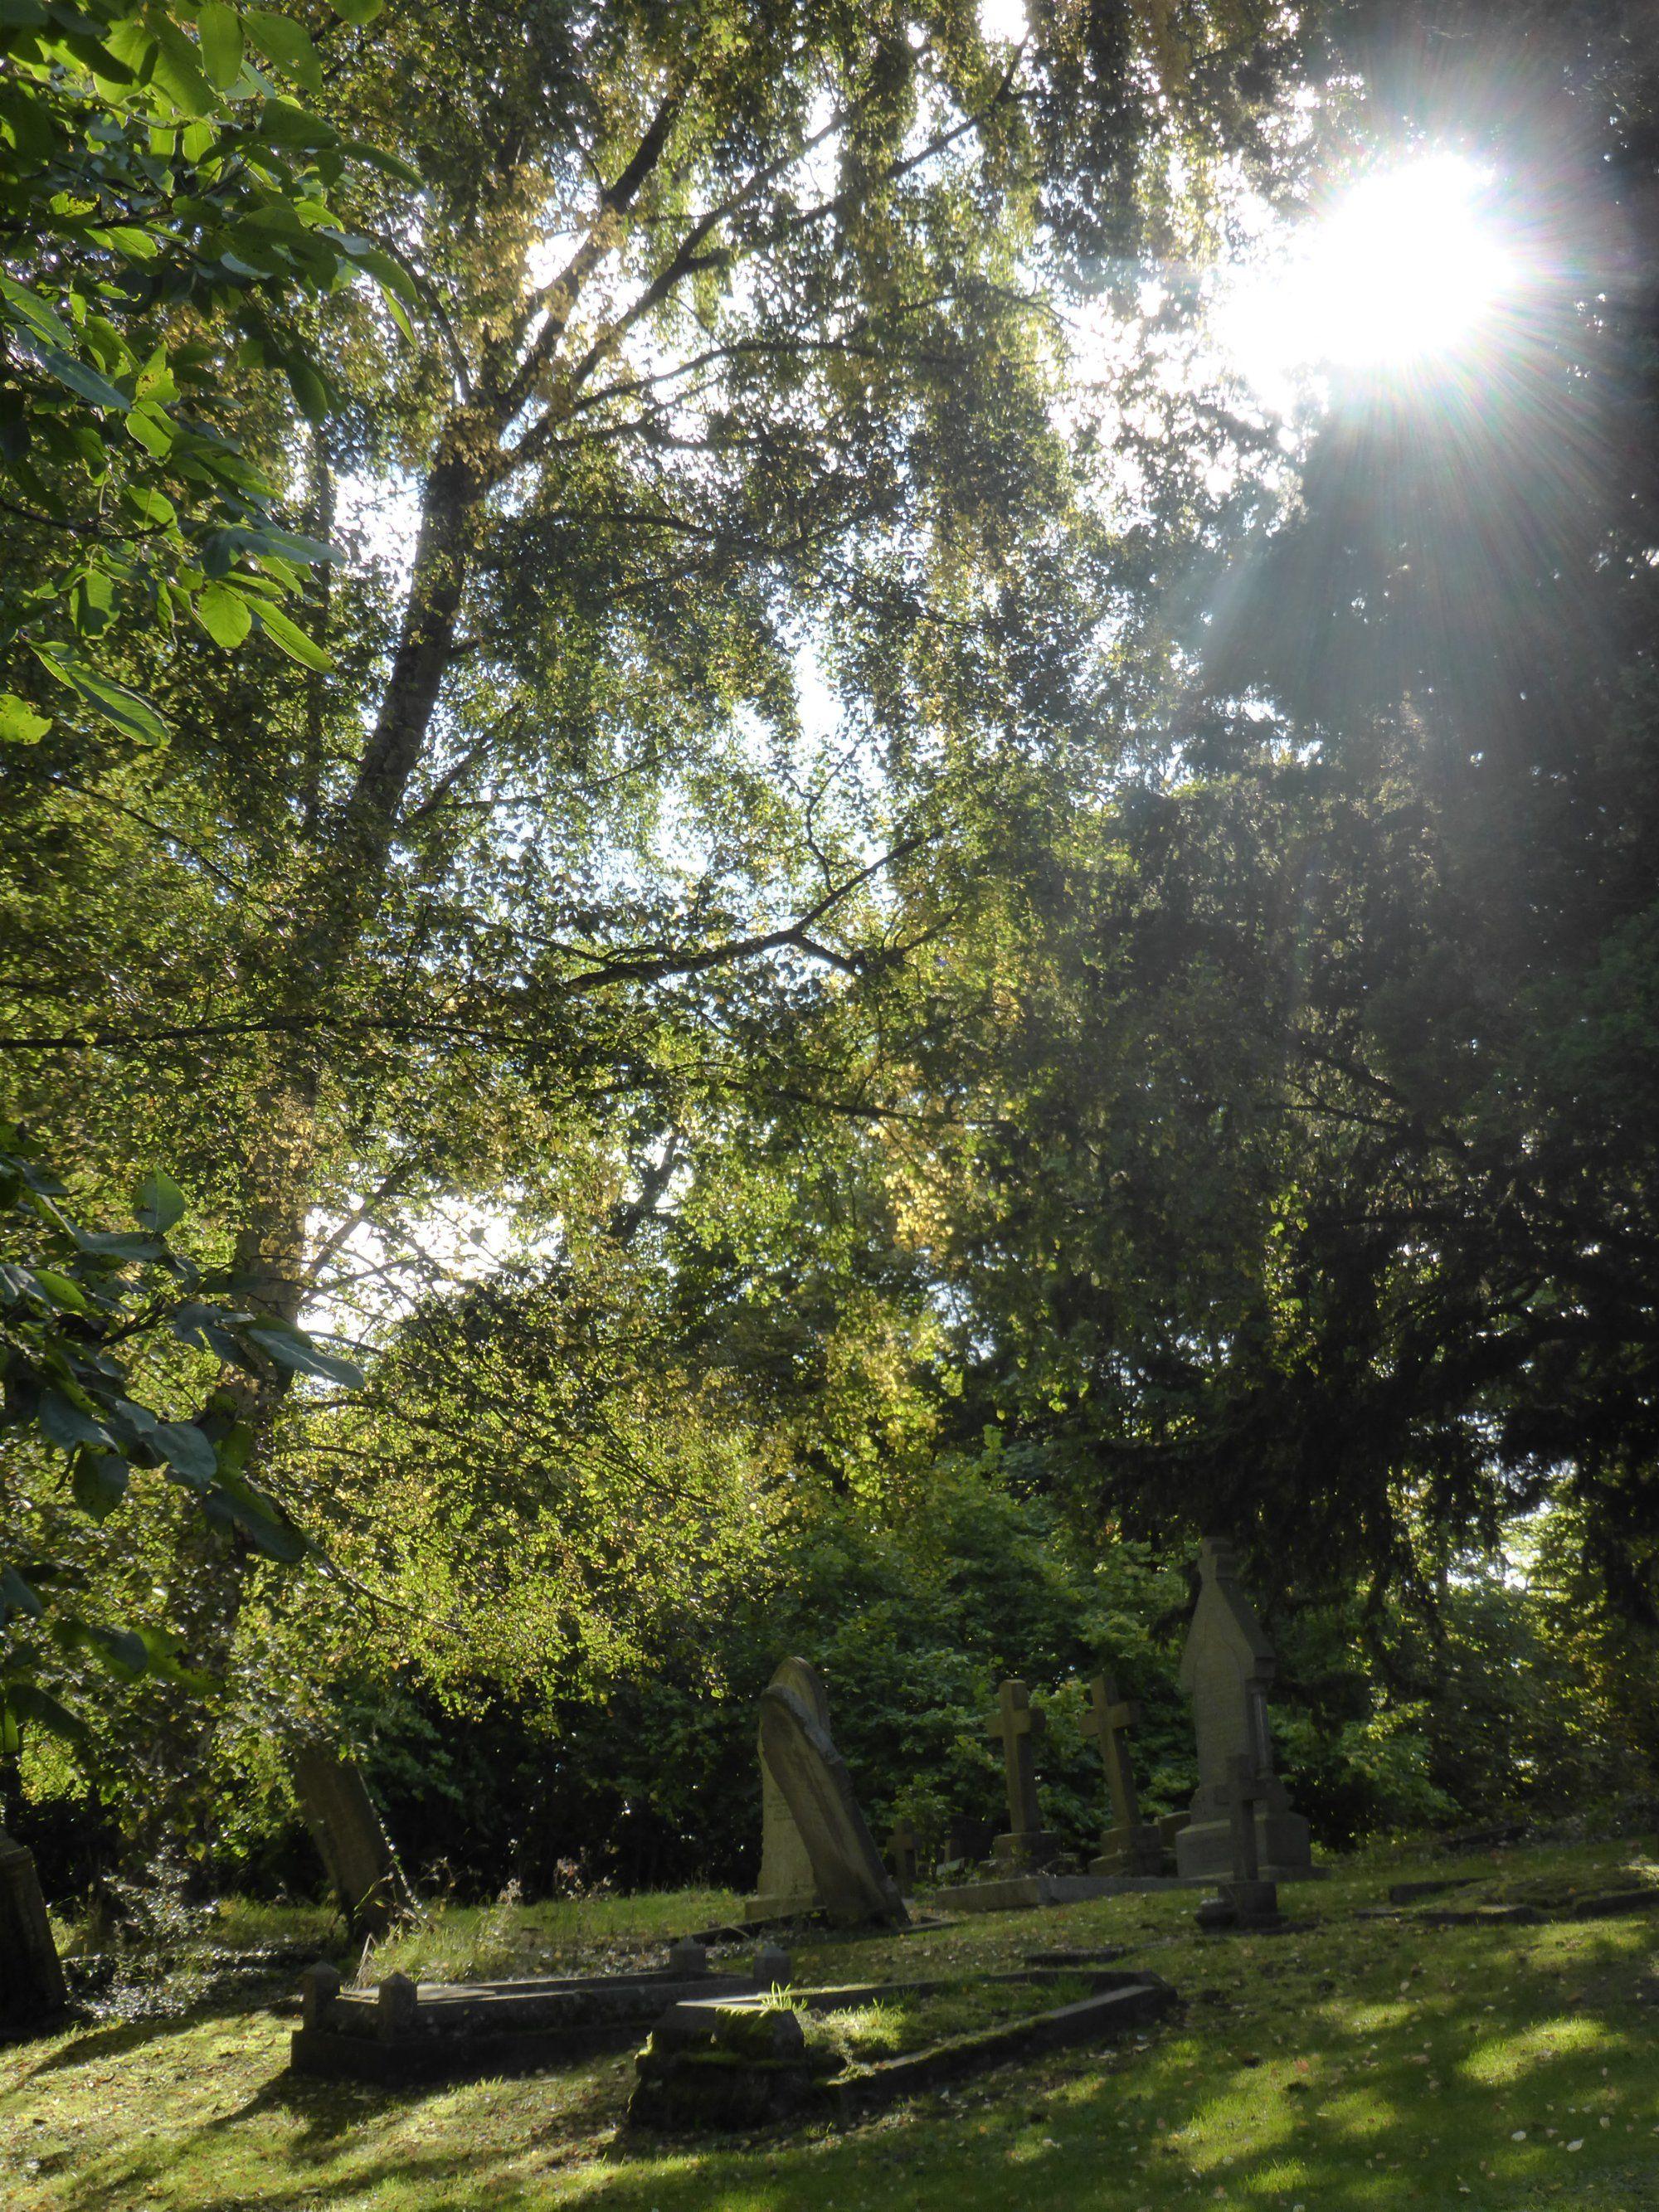 Rowington Churchyard, Warwickshire